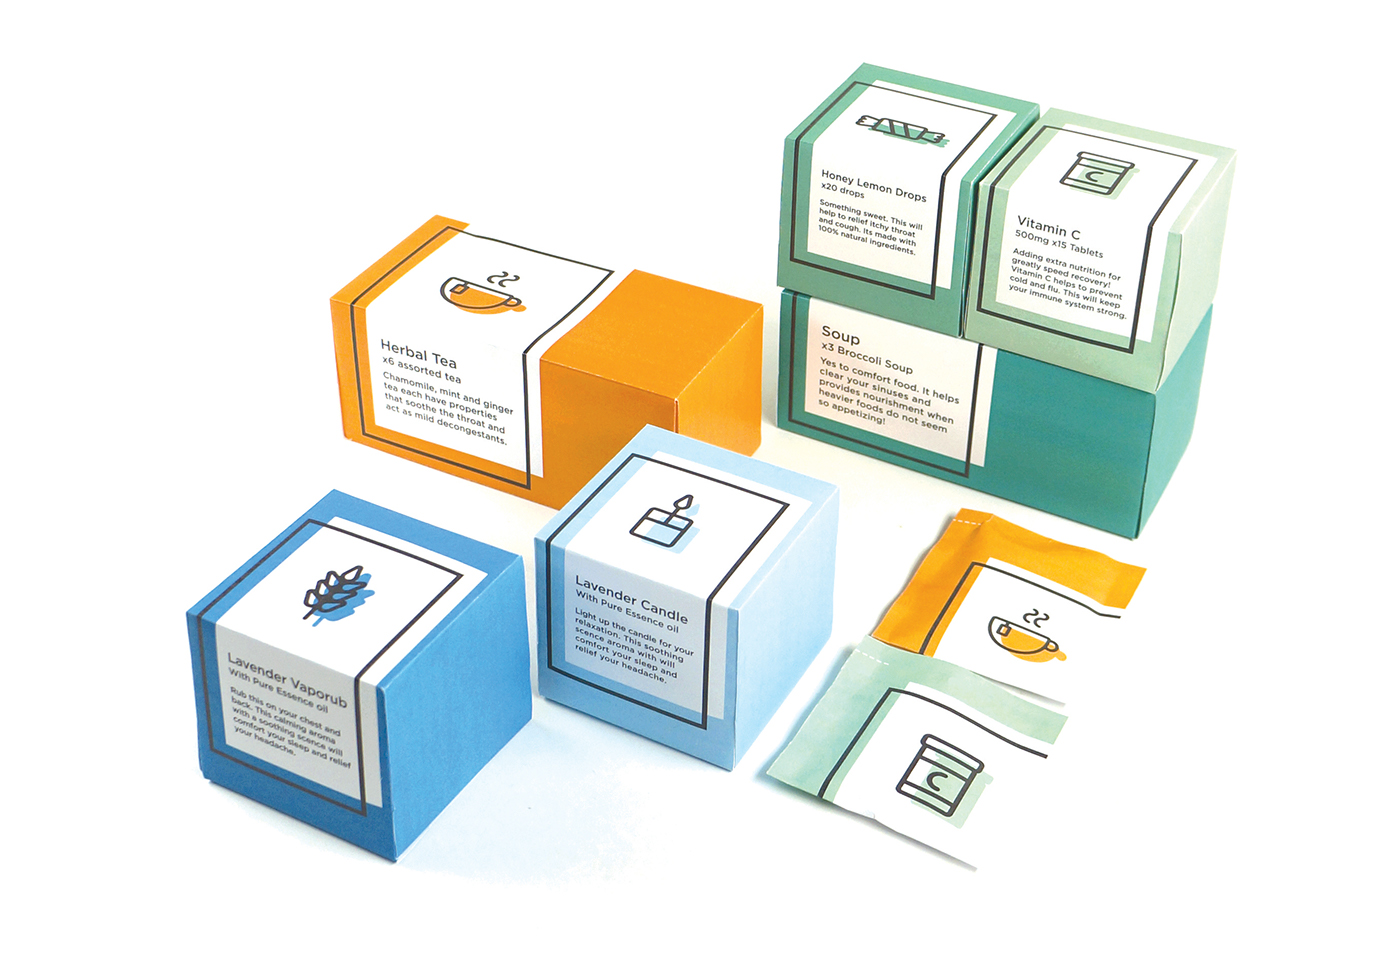 getwell icons design graphic clean minimal functional ysdn adaa_2015 adaa_school york_university_/_sheridan_college ADAA_Country Canada adaa_packaging